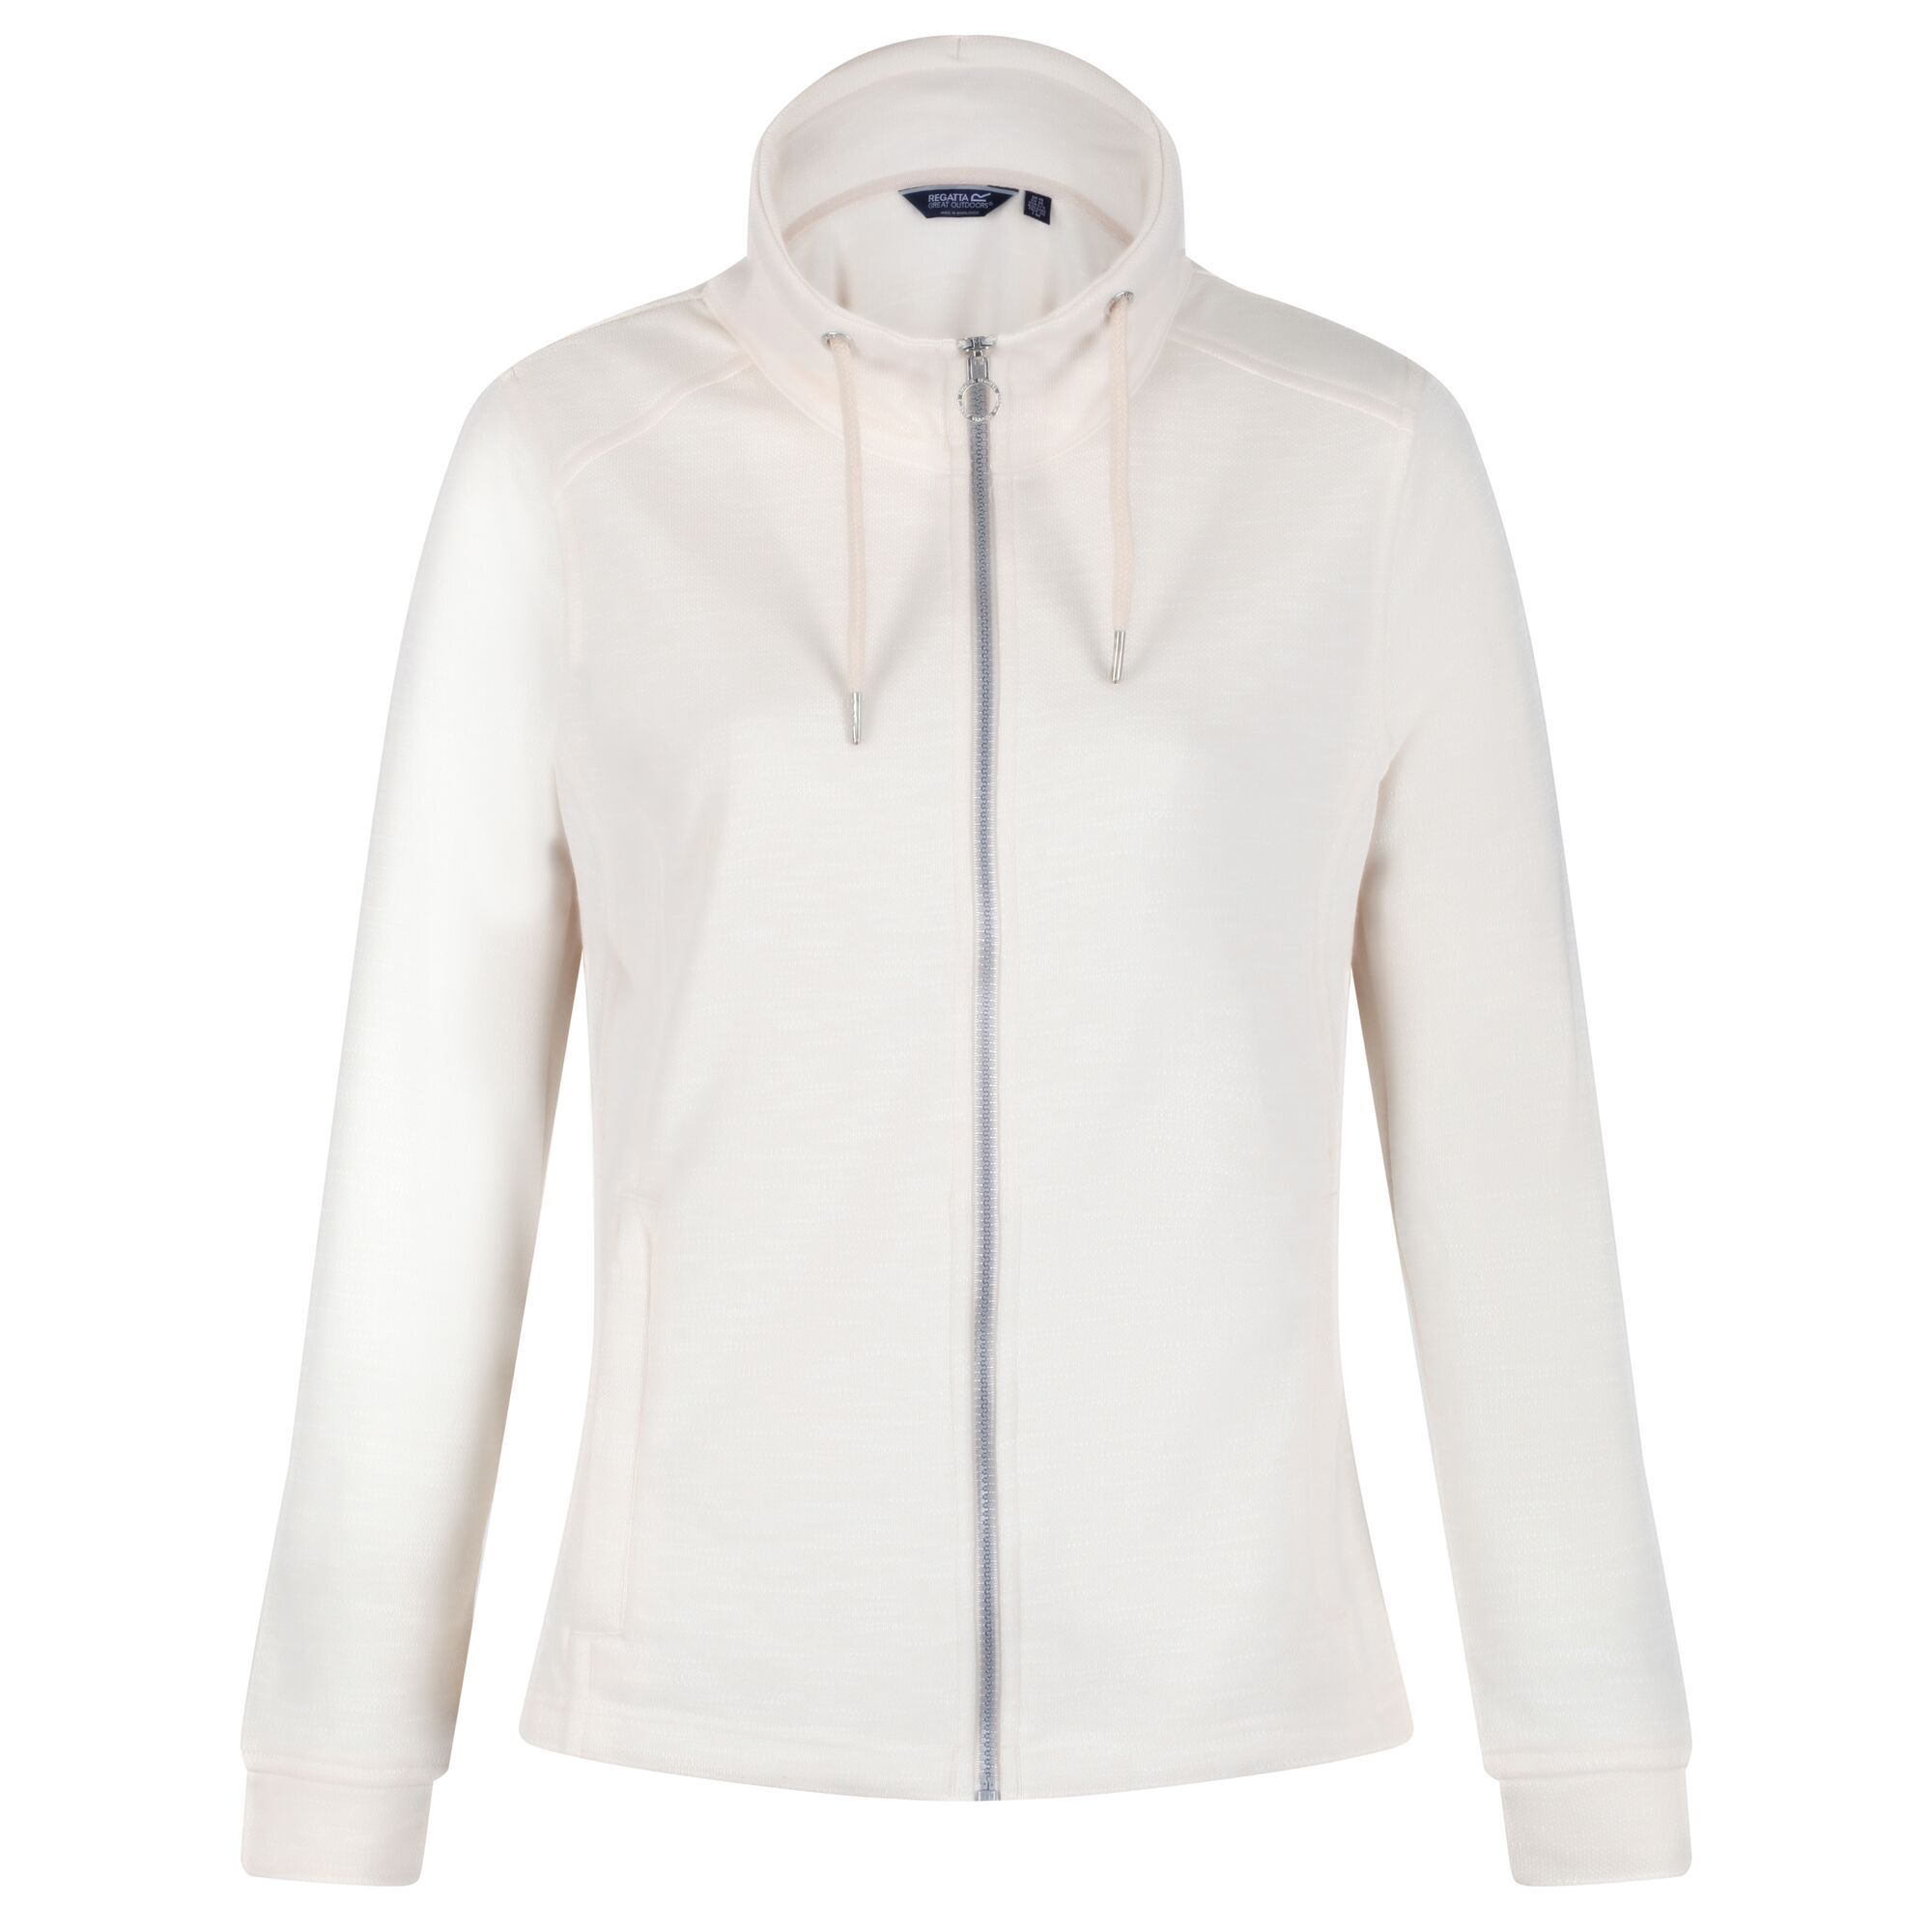 Regatta Womens/Ladies Olena Snood Collar Fleece Jacket (12 UK) (Light Vanilla)